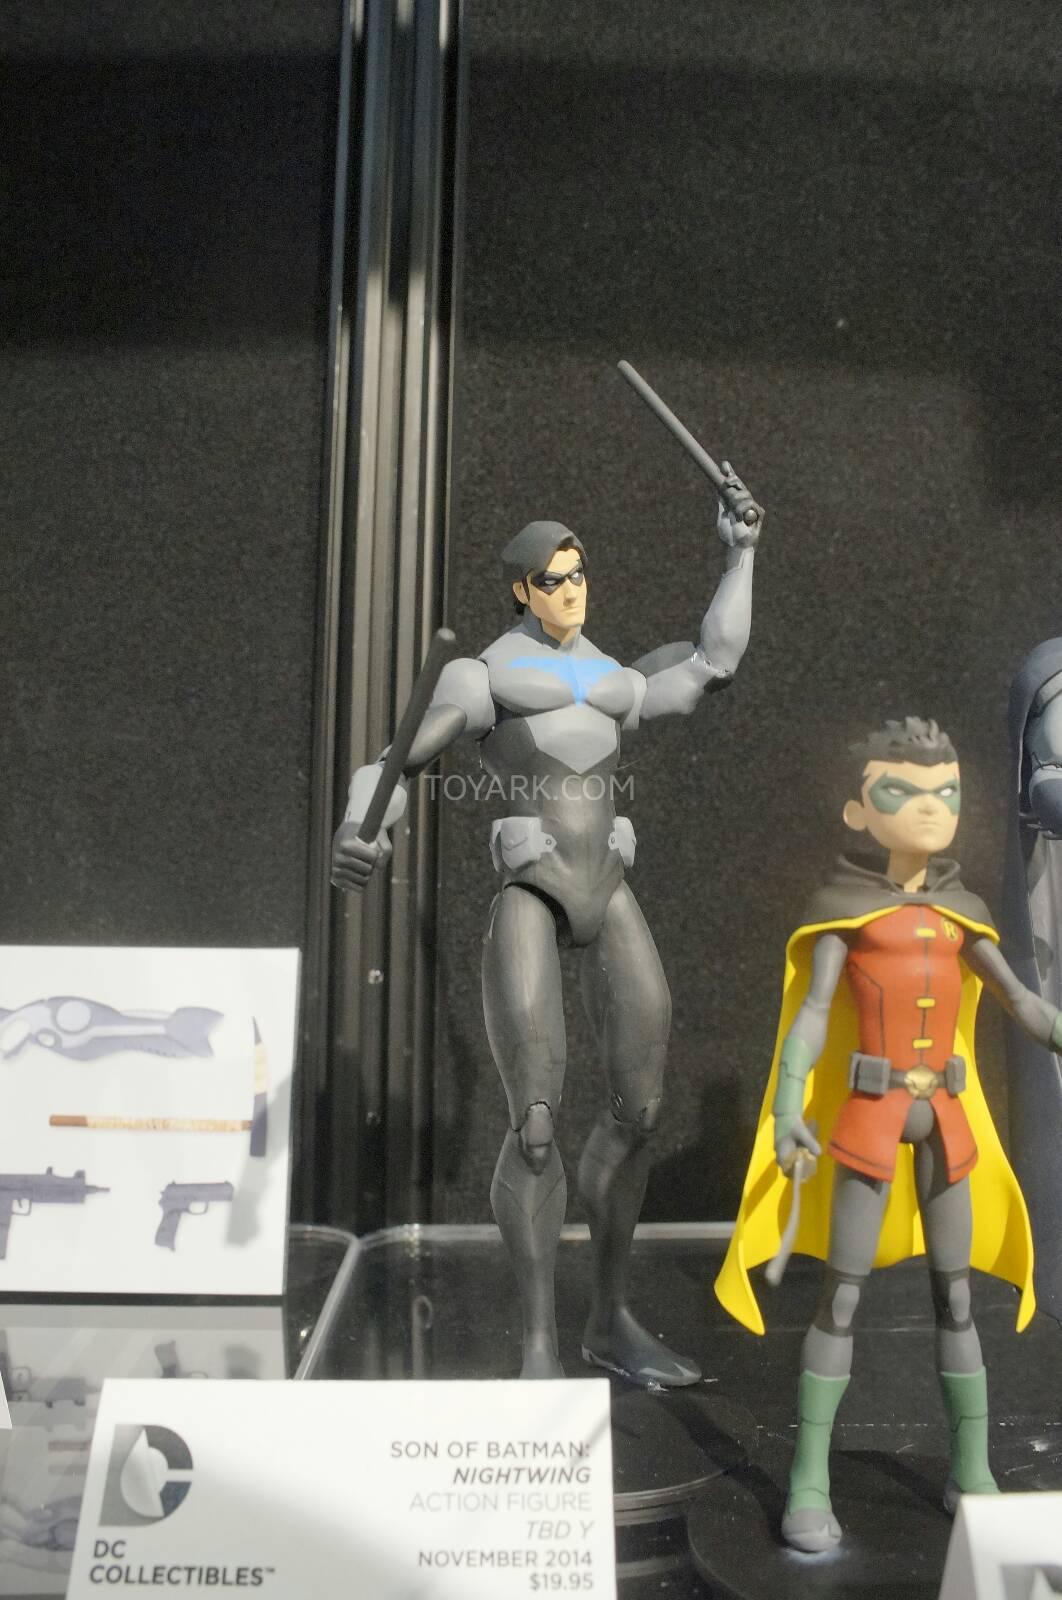 [Toy Fair 2014] DC Collectibles Toy-Fair-2014-DC-Collectibles-109